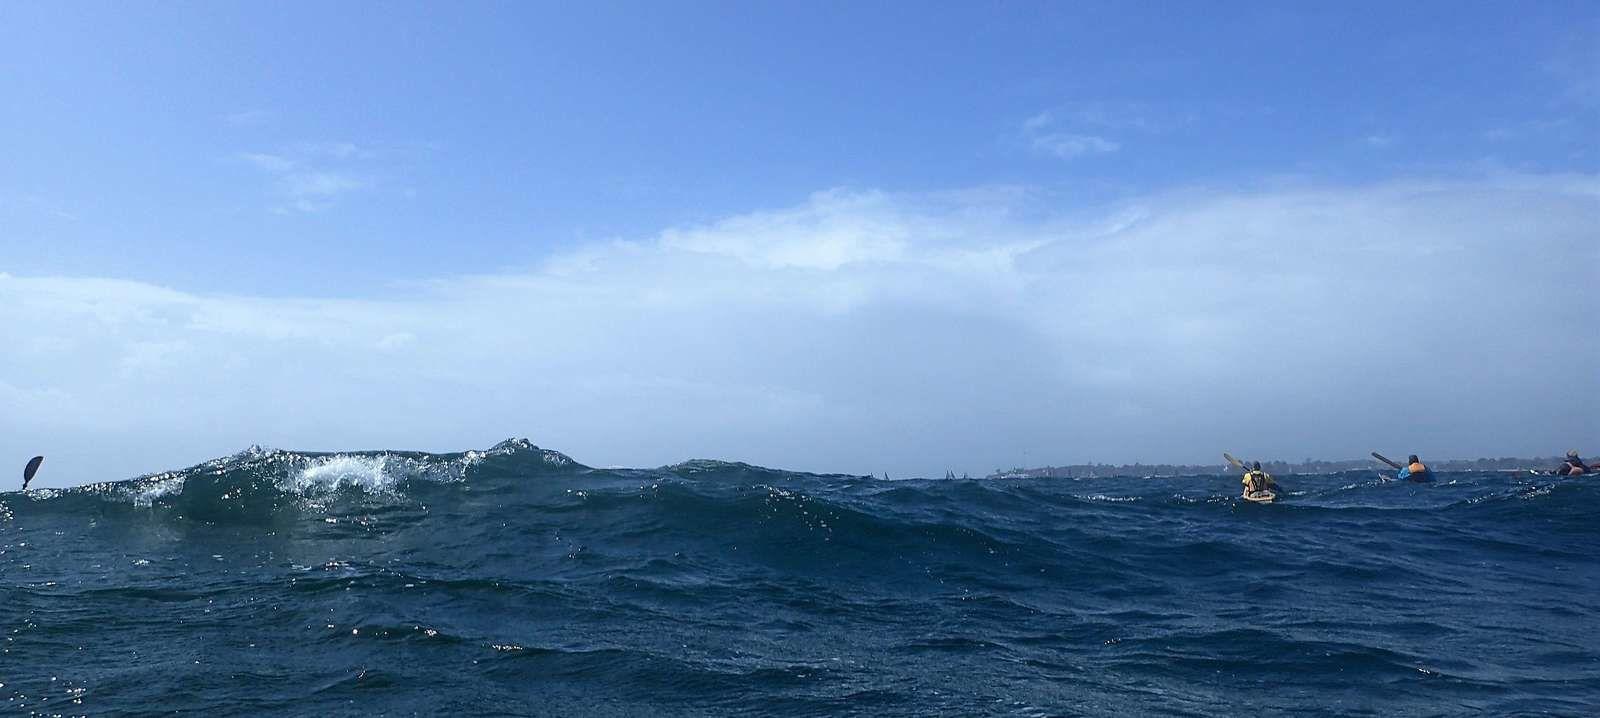 CK/mer en baie de Concarneau